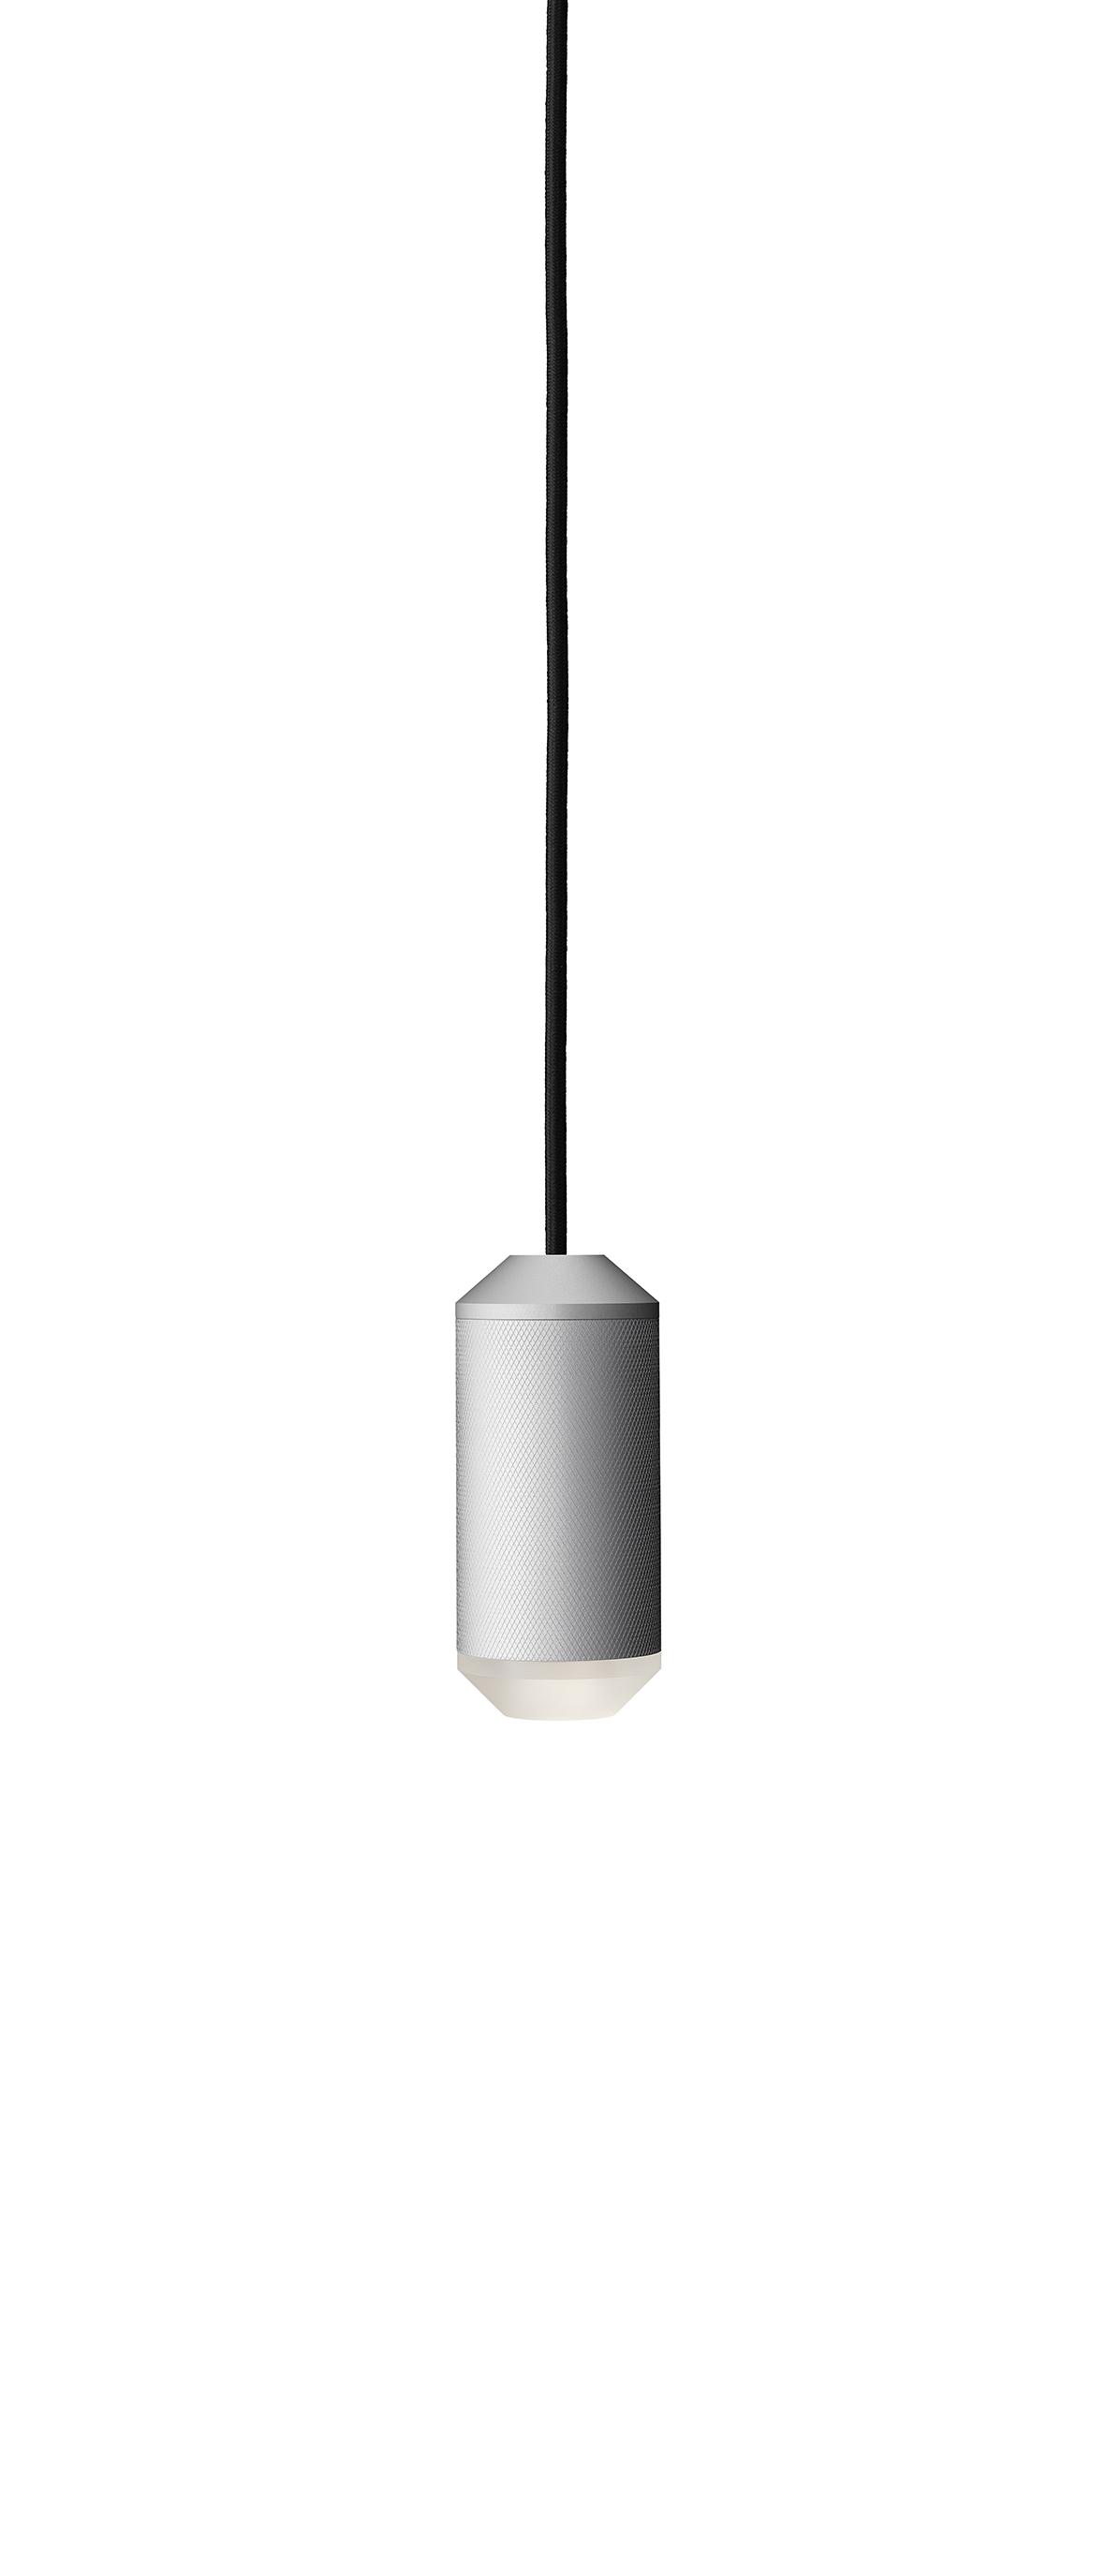 Lustra Backbeat / Acrylic bottom, Ø6,5 cm, H14,5 cm, Silver